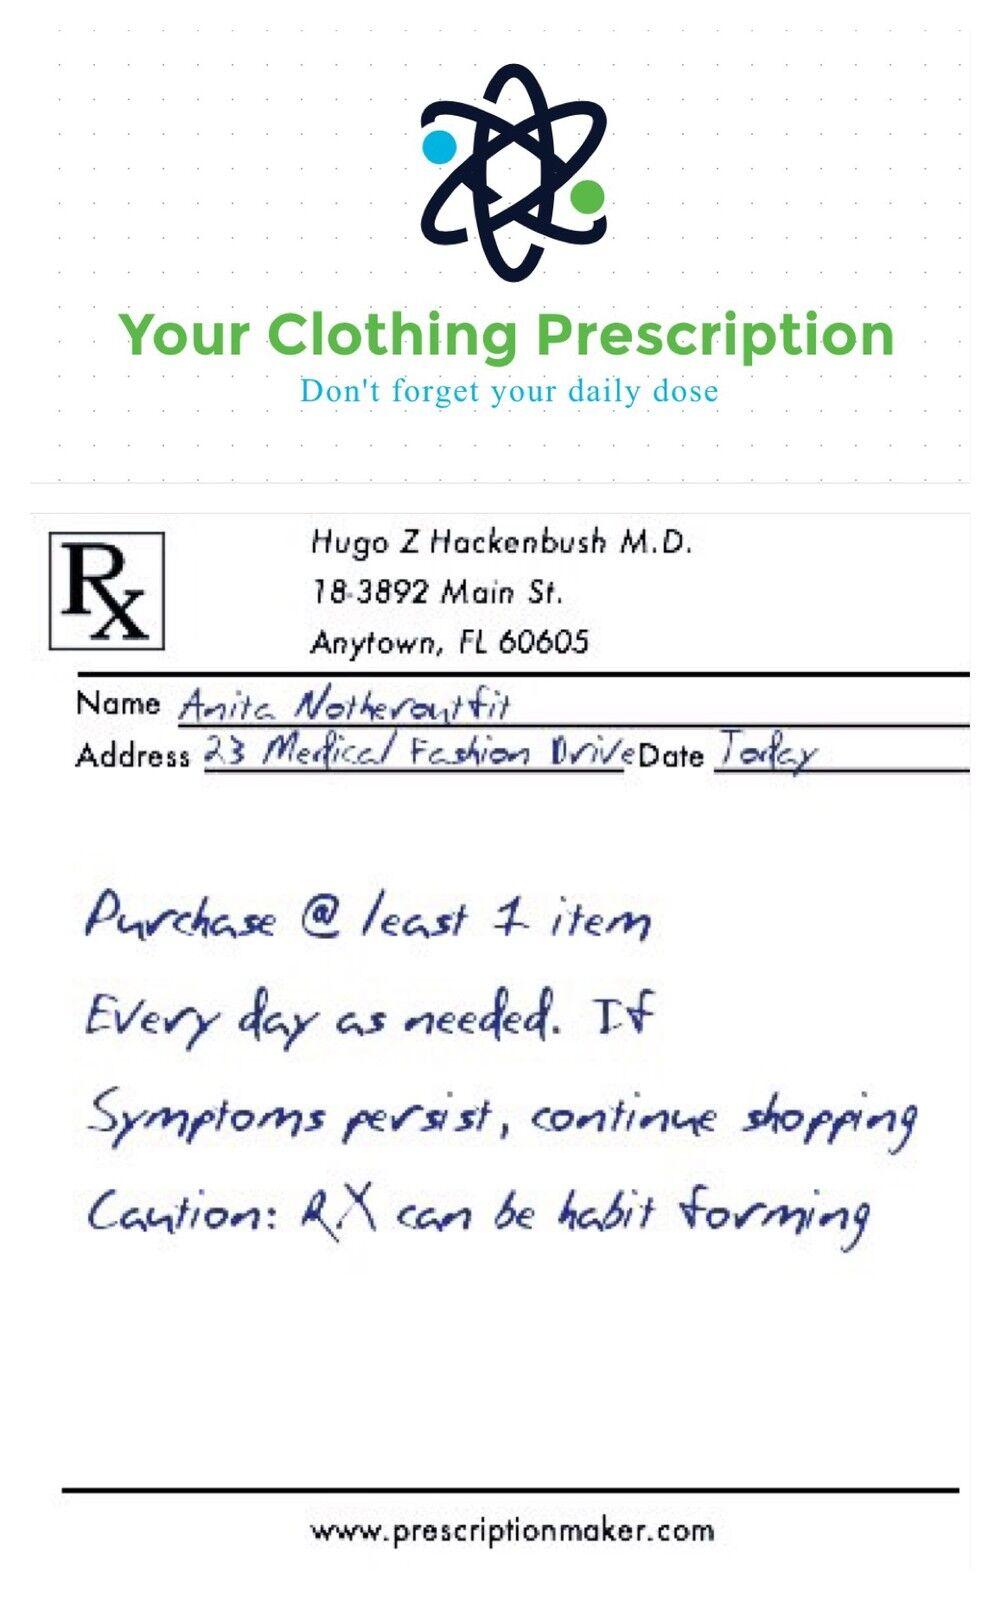 Your Clothing Prescription